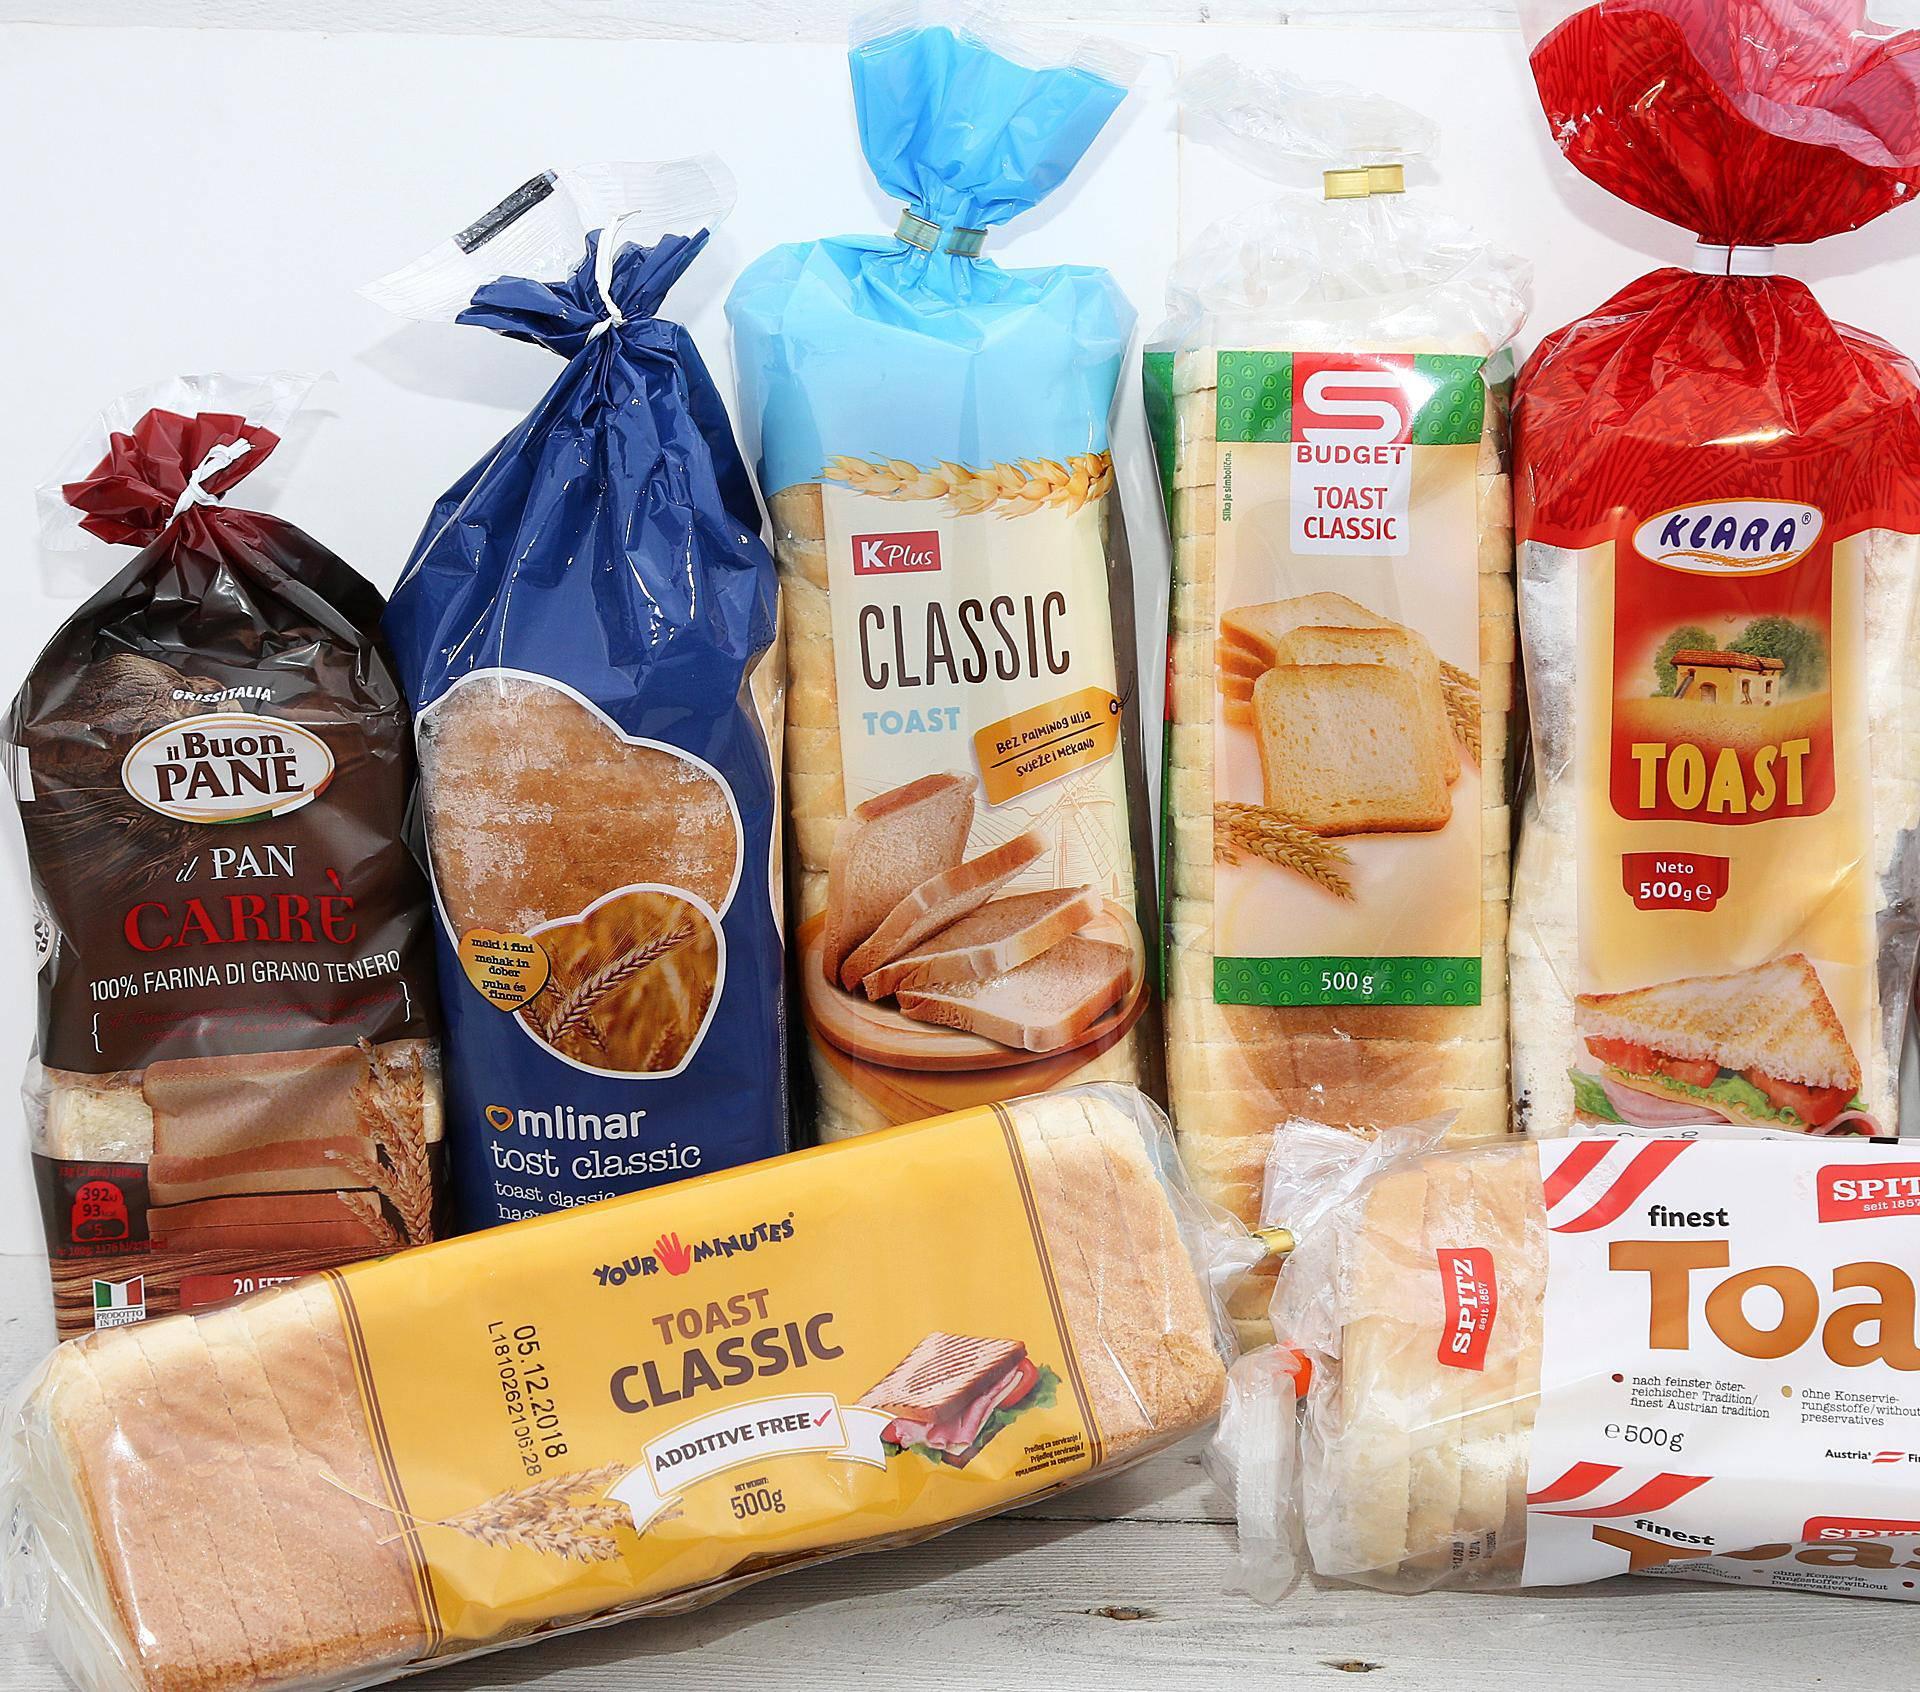 Nakon otvaranja tost treba u hladnjak, a štitit će ga alkohol